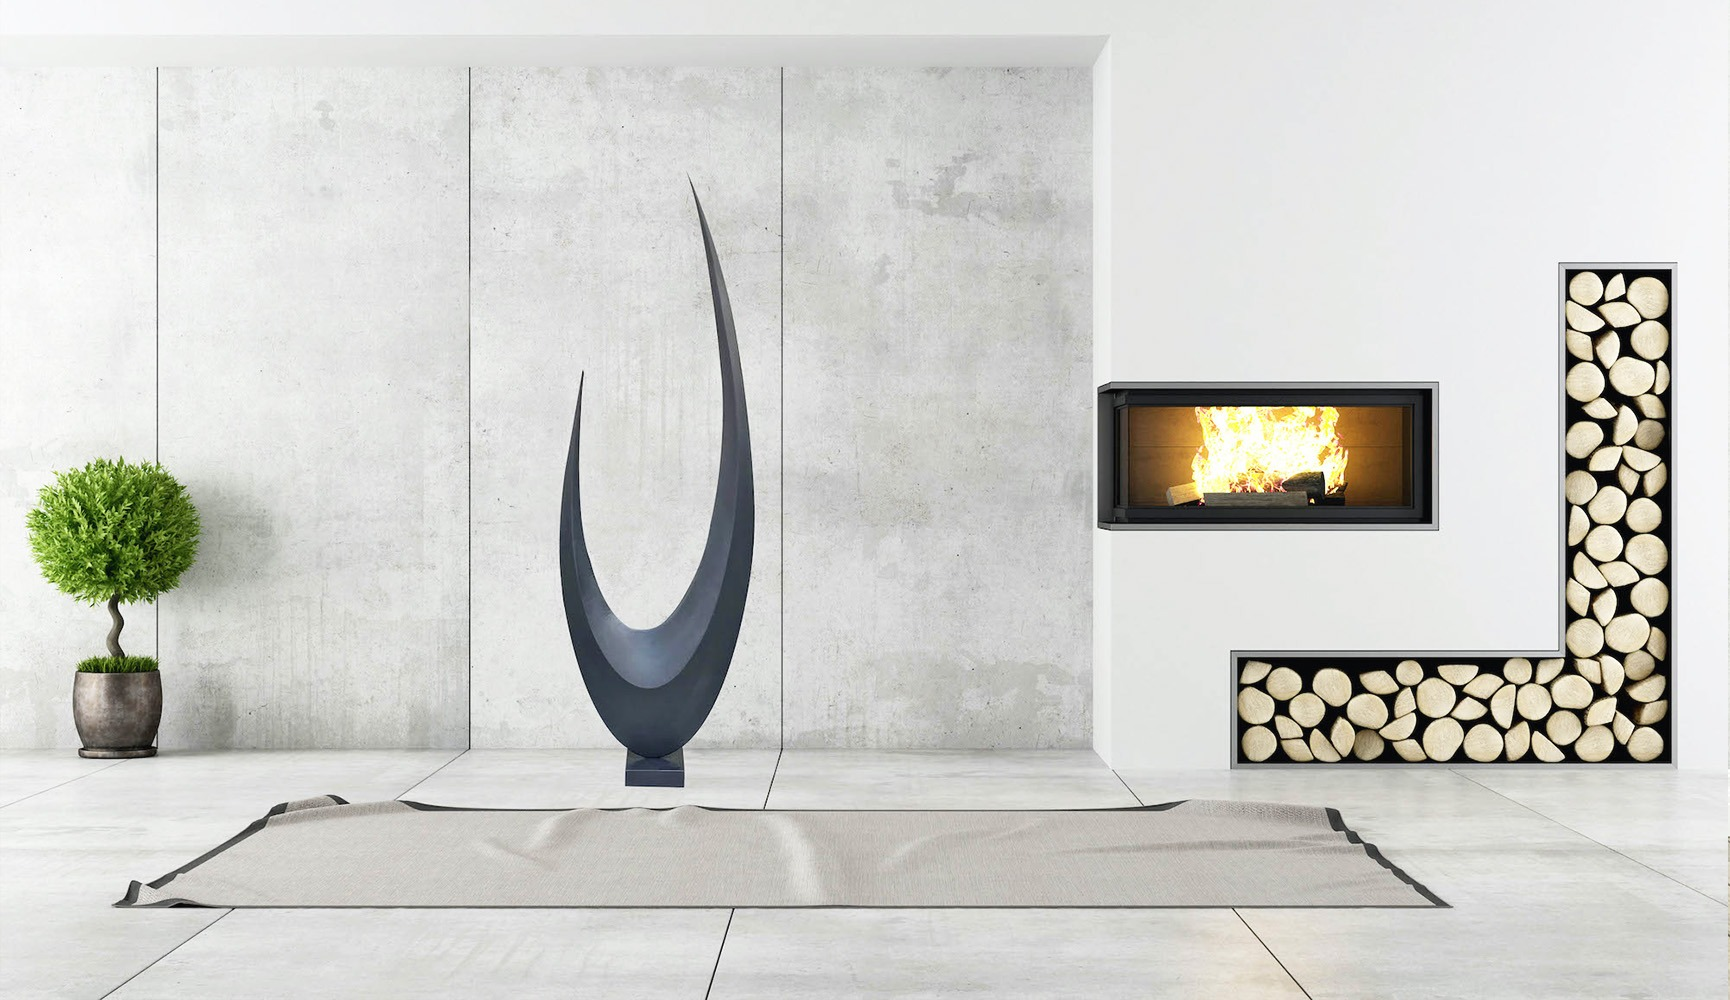 sculpture métal  de francis guerrier